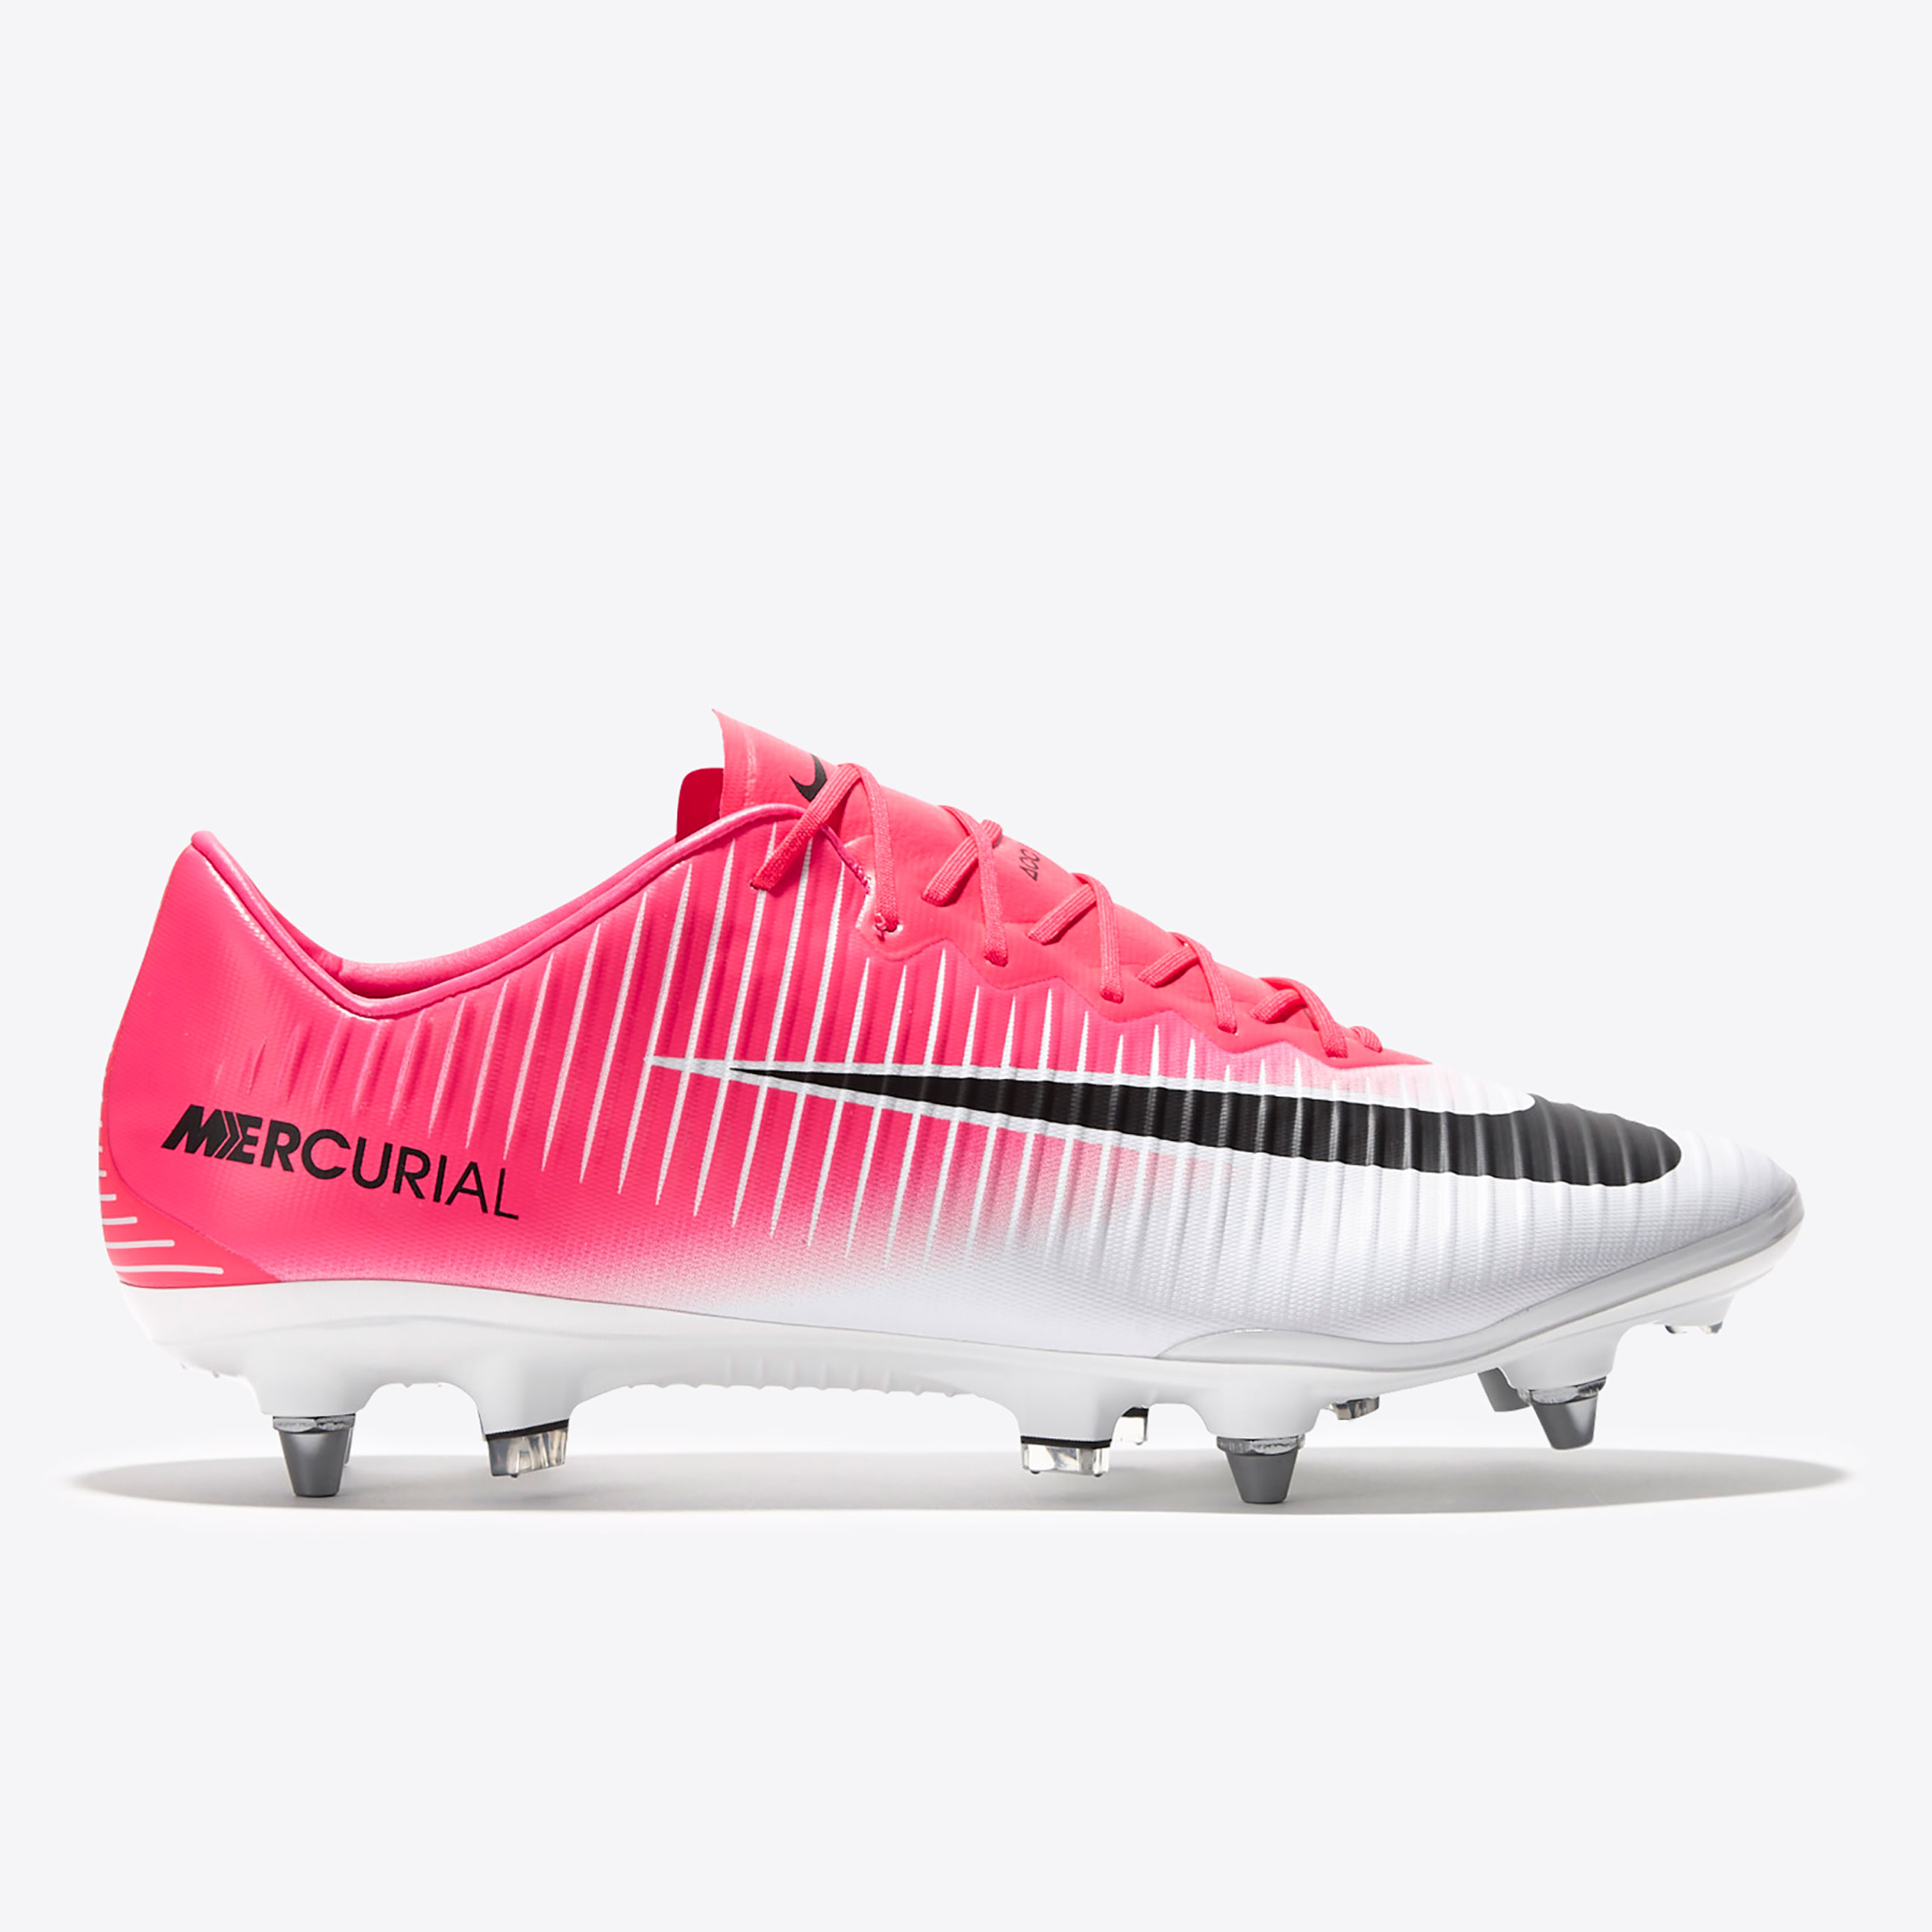 premium selection de8cd ce611 Nike Mercurial Vapor XI Motion Blur Pack SG Football Boots Pink